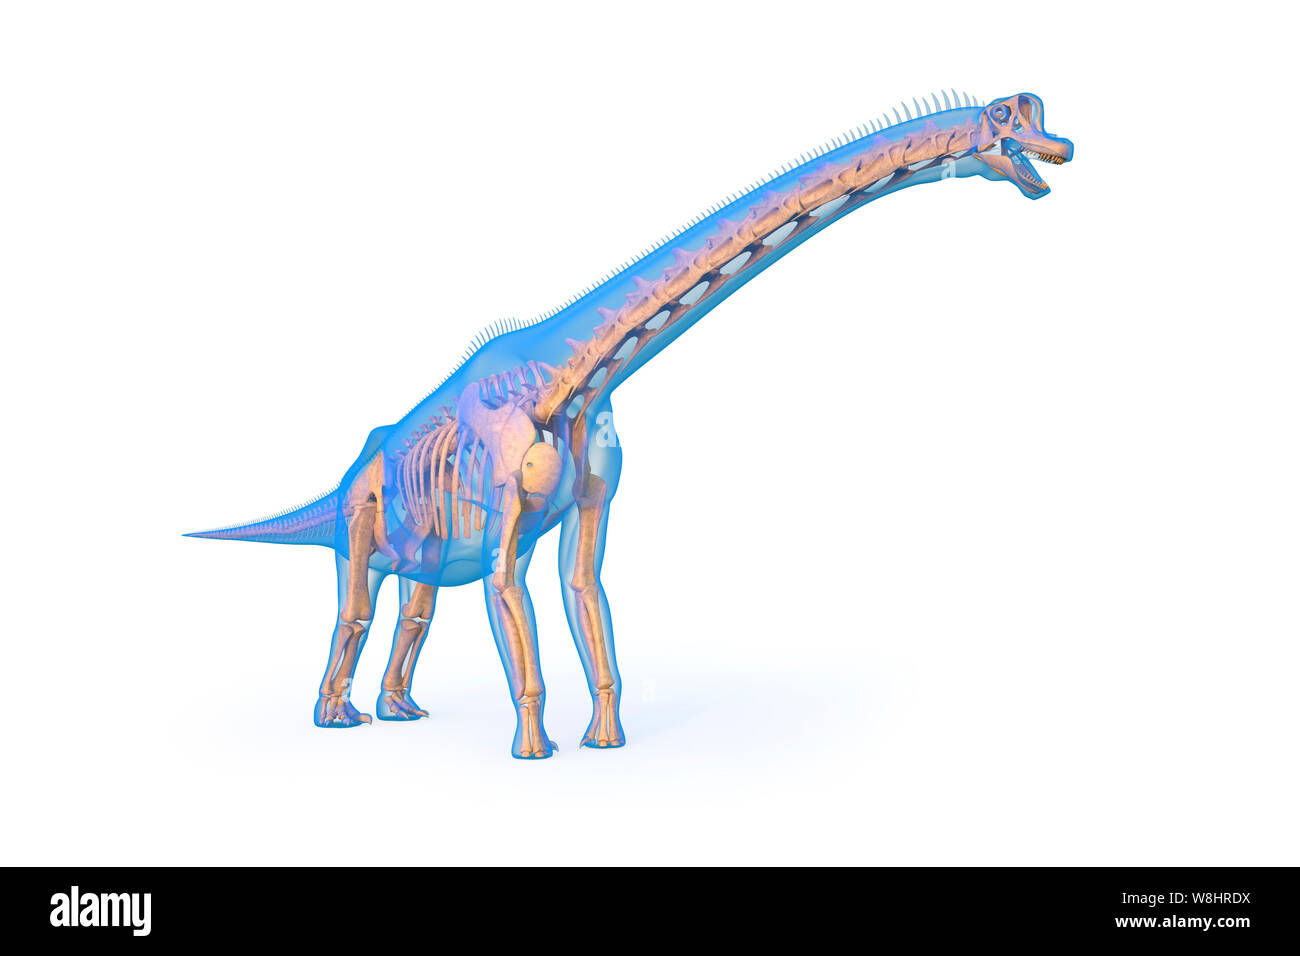 Brachiosaurus dinosaur skeletal structure, illustration. Brachiosaurs lived 154-153 million years ago during the late Jurassic period. Stock Photo